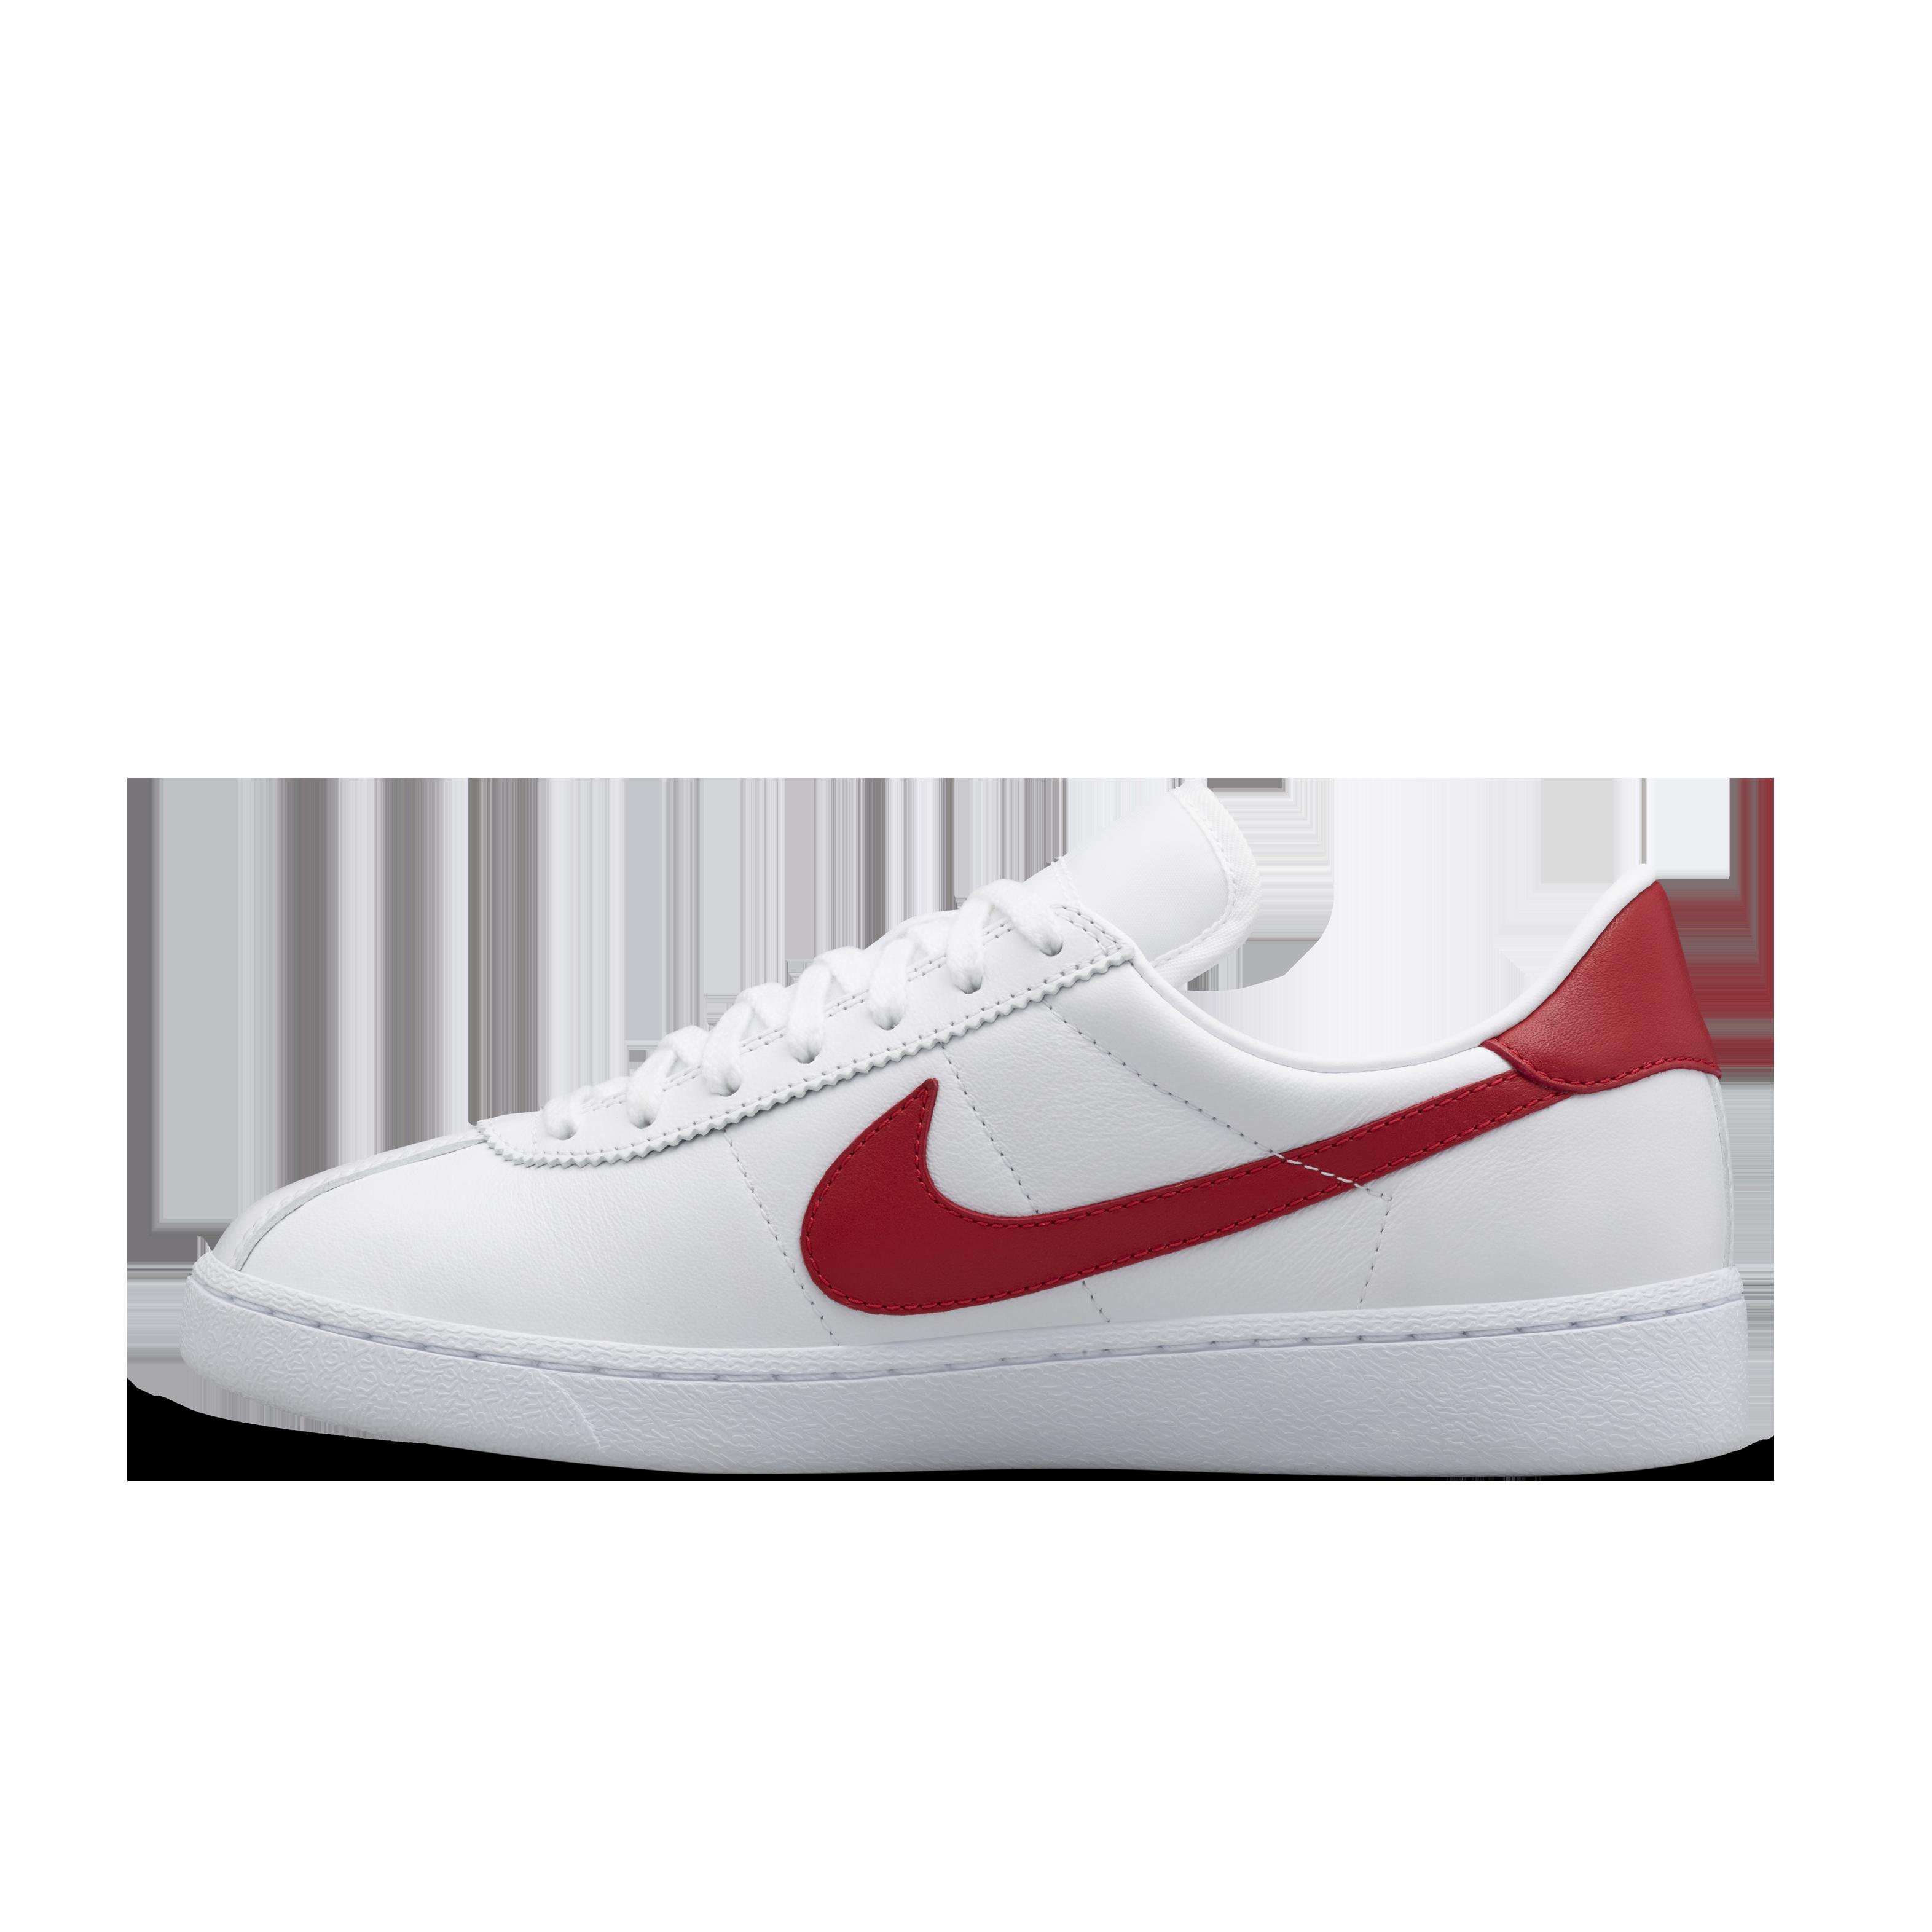 Nike Bruin Red Cheap Nike Bruin Red Cheap International College of